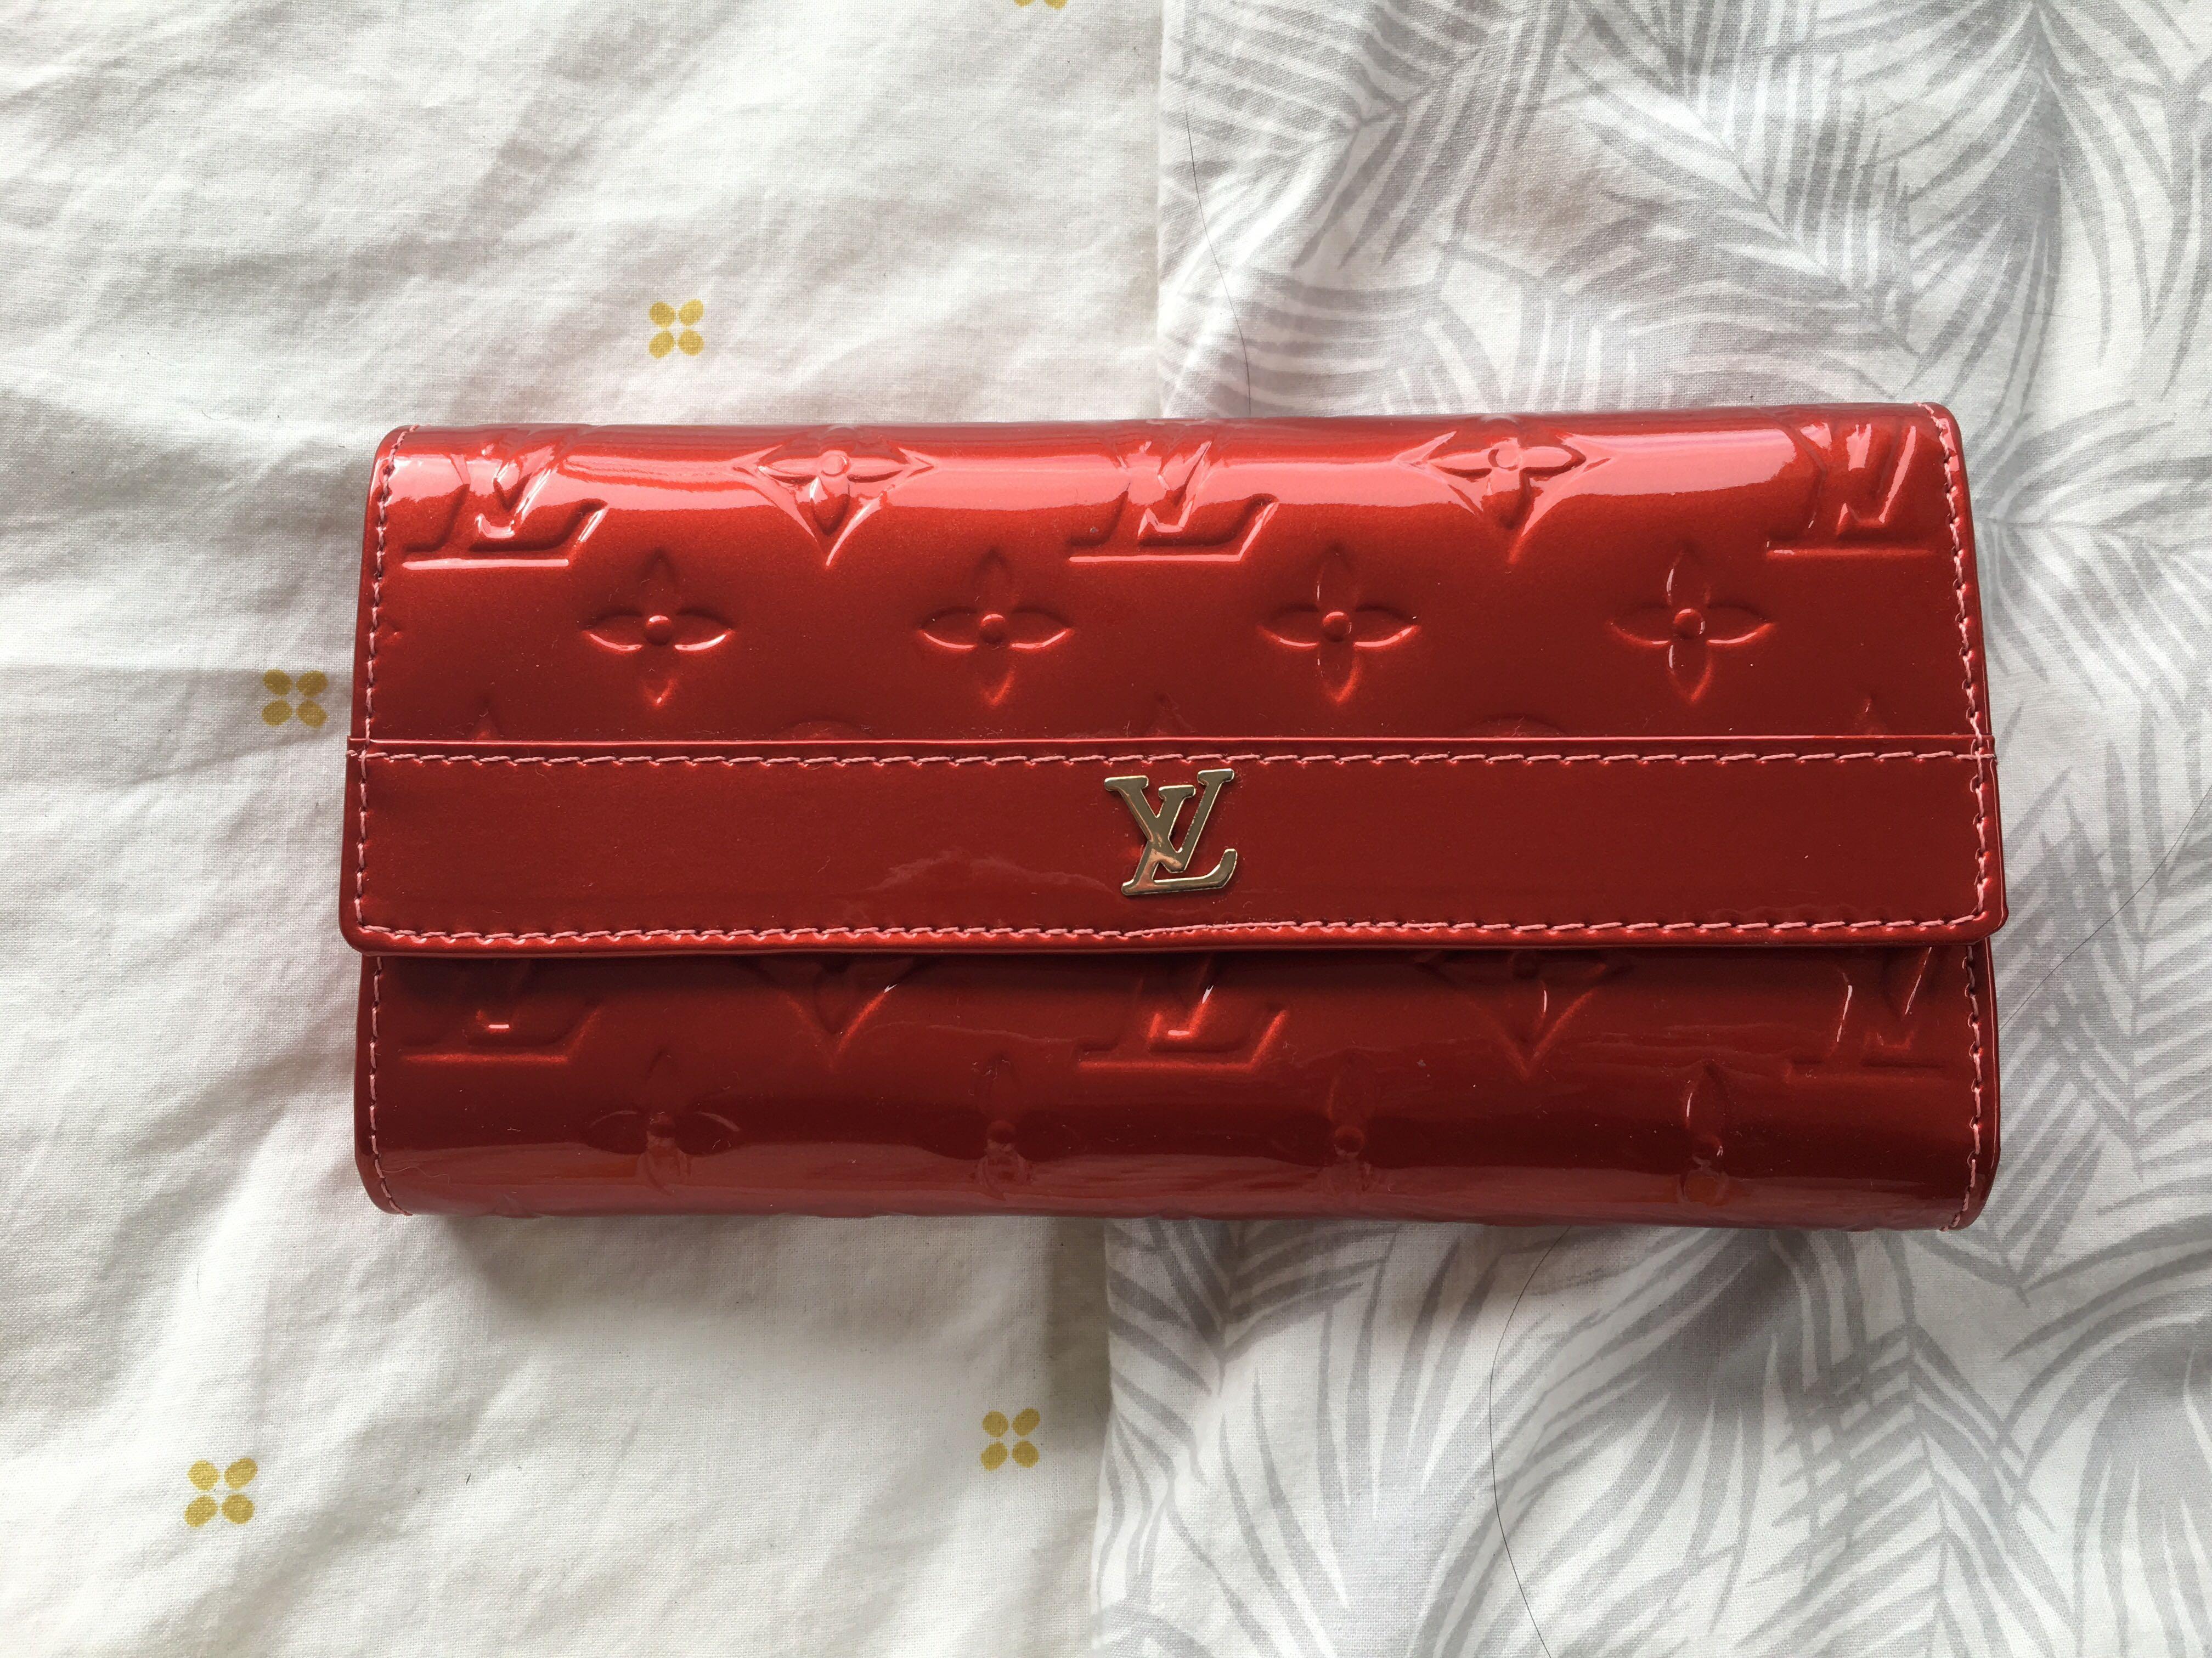 New LV Sarah Wallet Replica